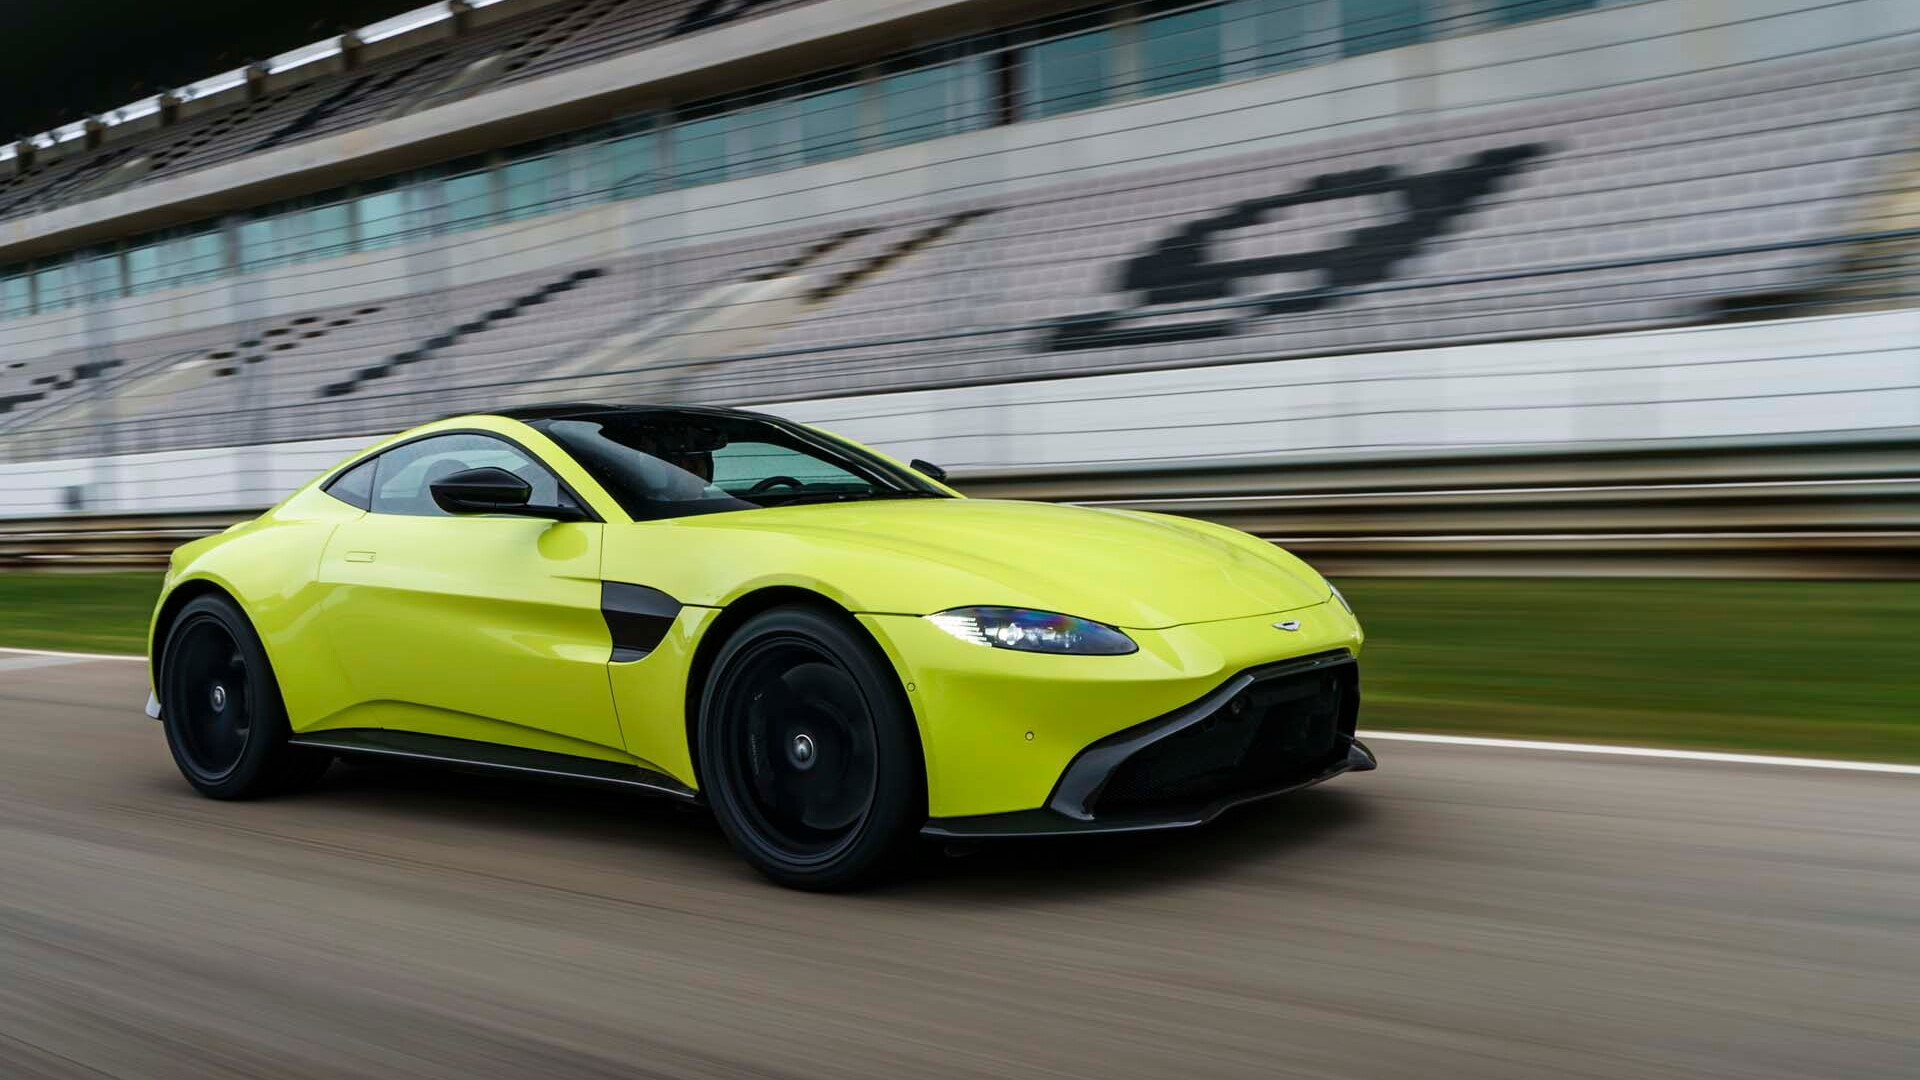 2019 Aston Martin Vantage first drive review: Tilting at